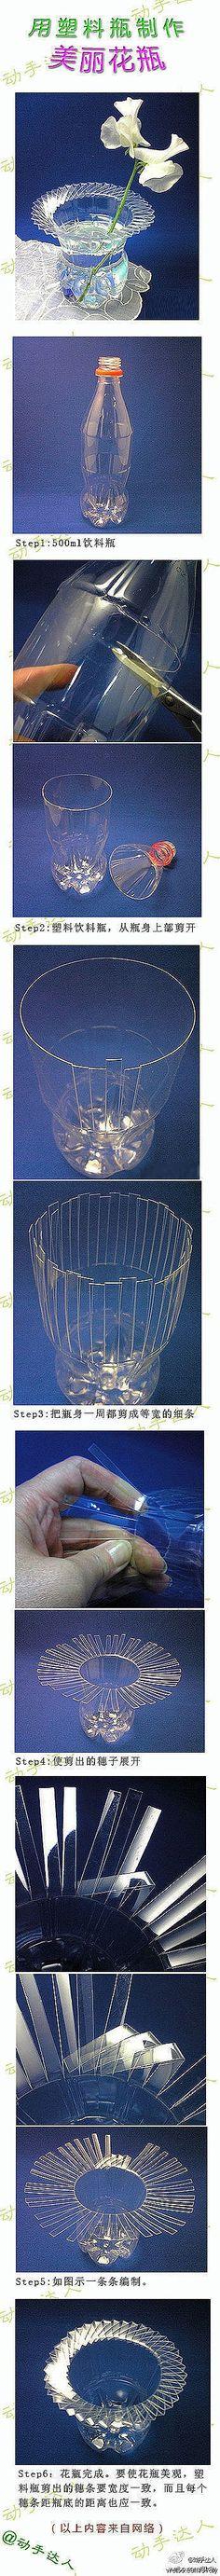 The handmade DIY] vase or cup from a soda pop plastic bottle.  http://www.digu.com/pin/tnypokbwtqxpn